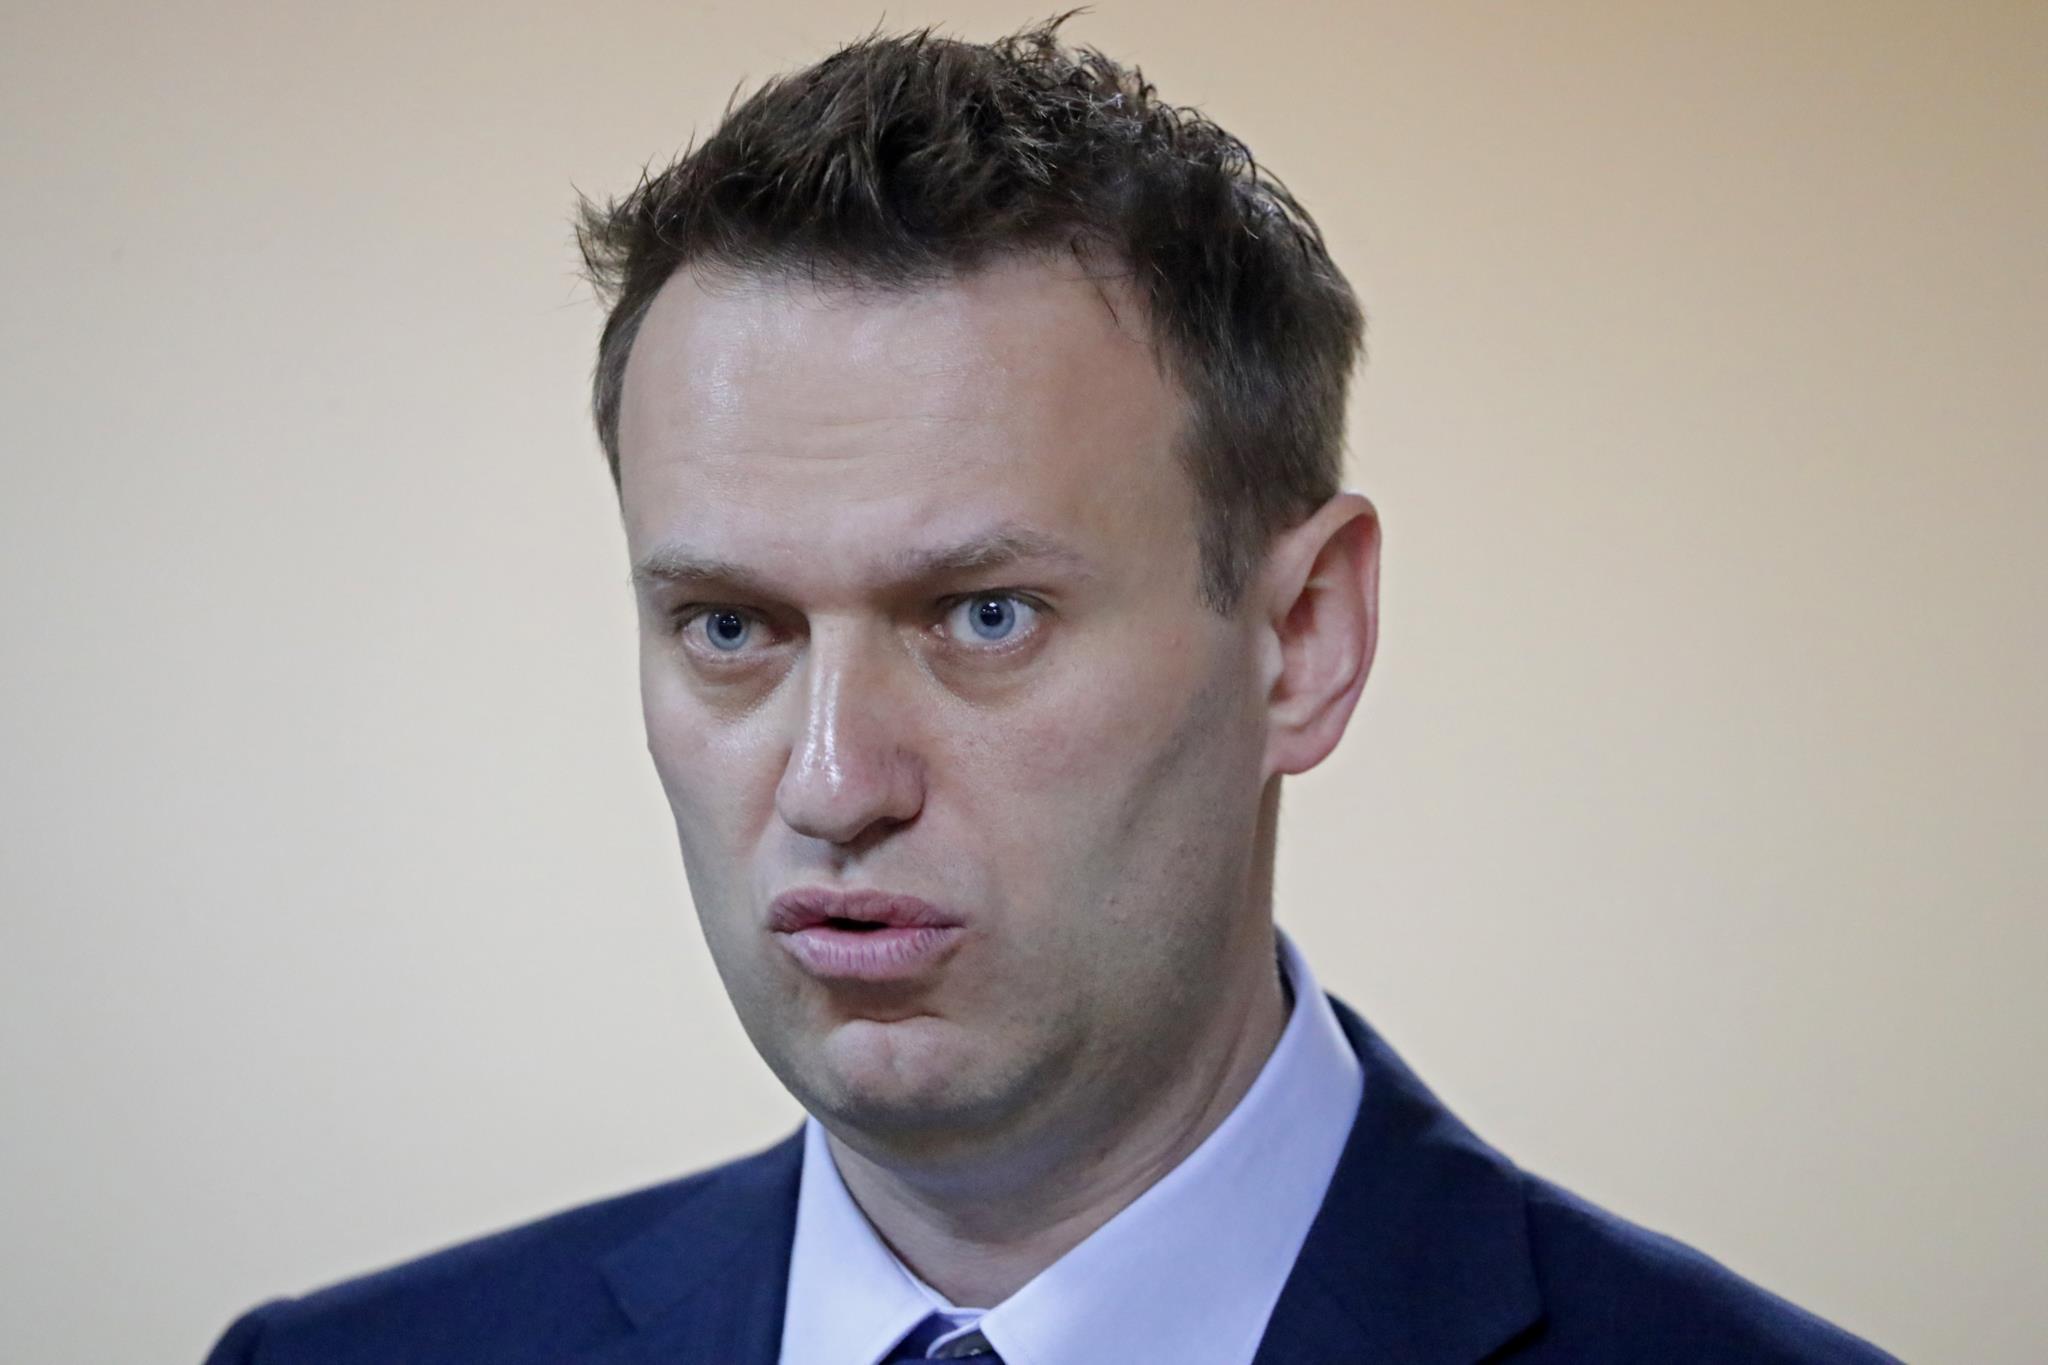 PÚBLICO - Navalni formalmente impedido de se candidatar contra Putin